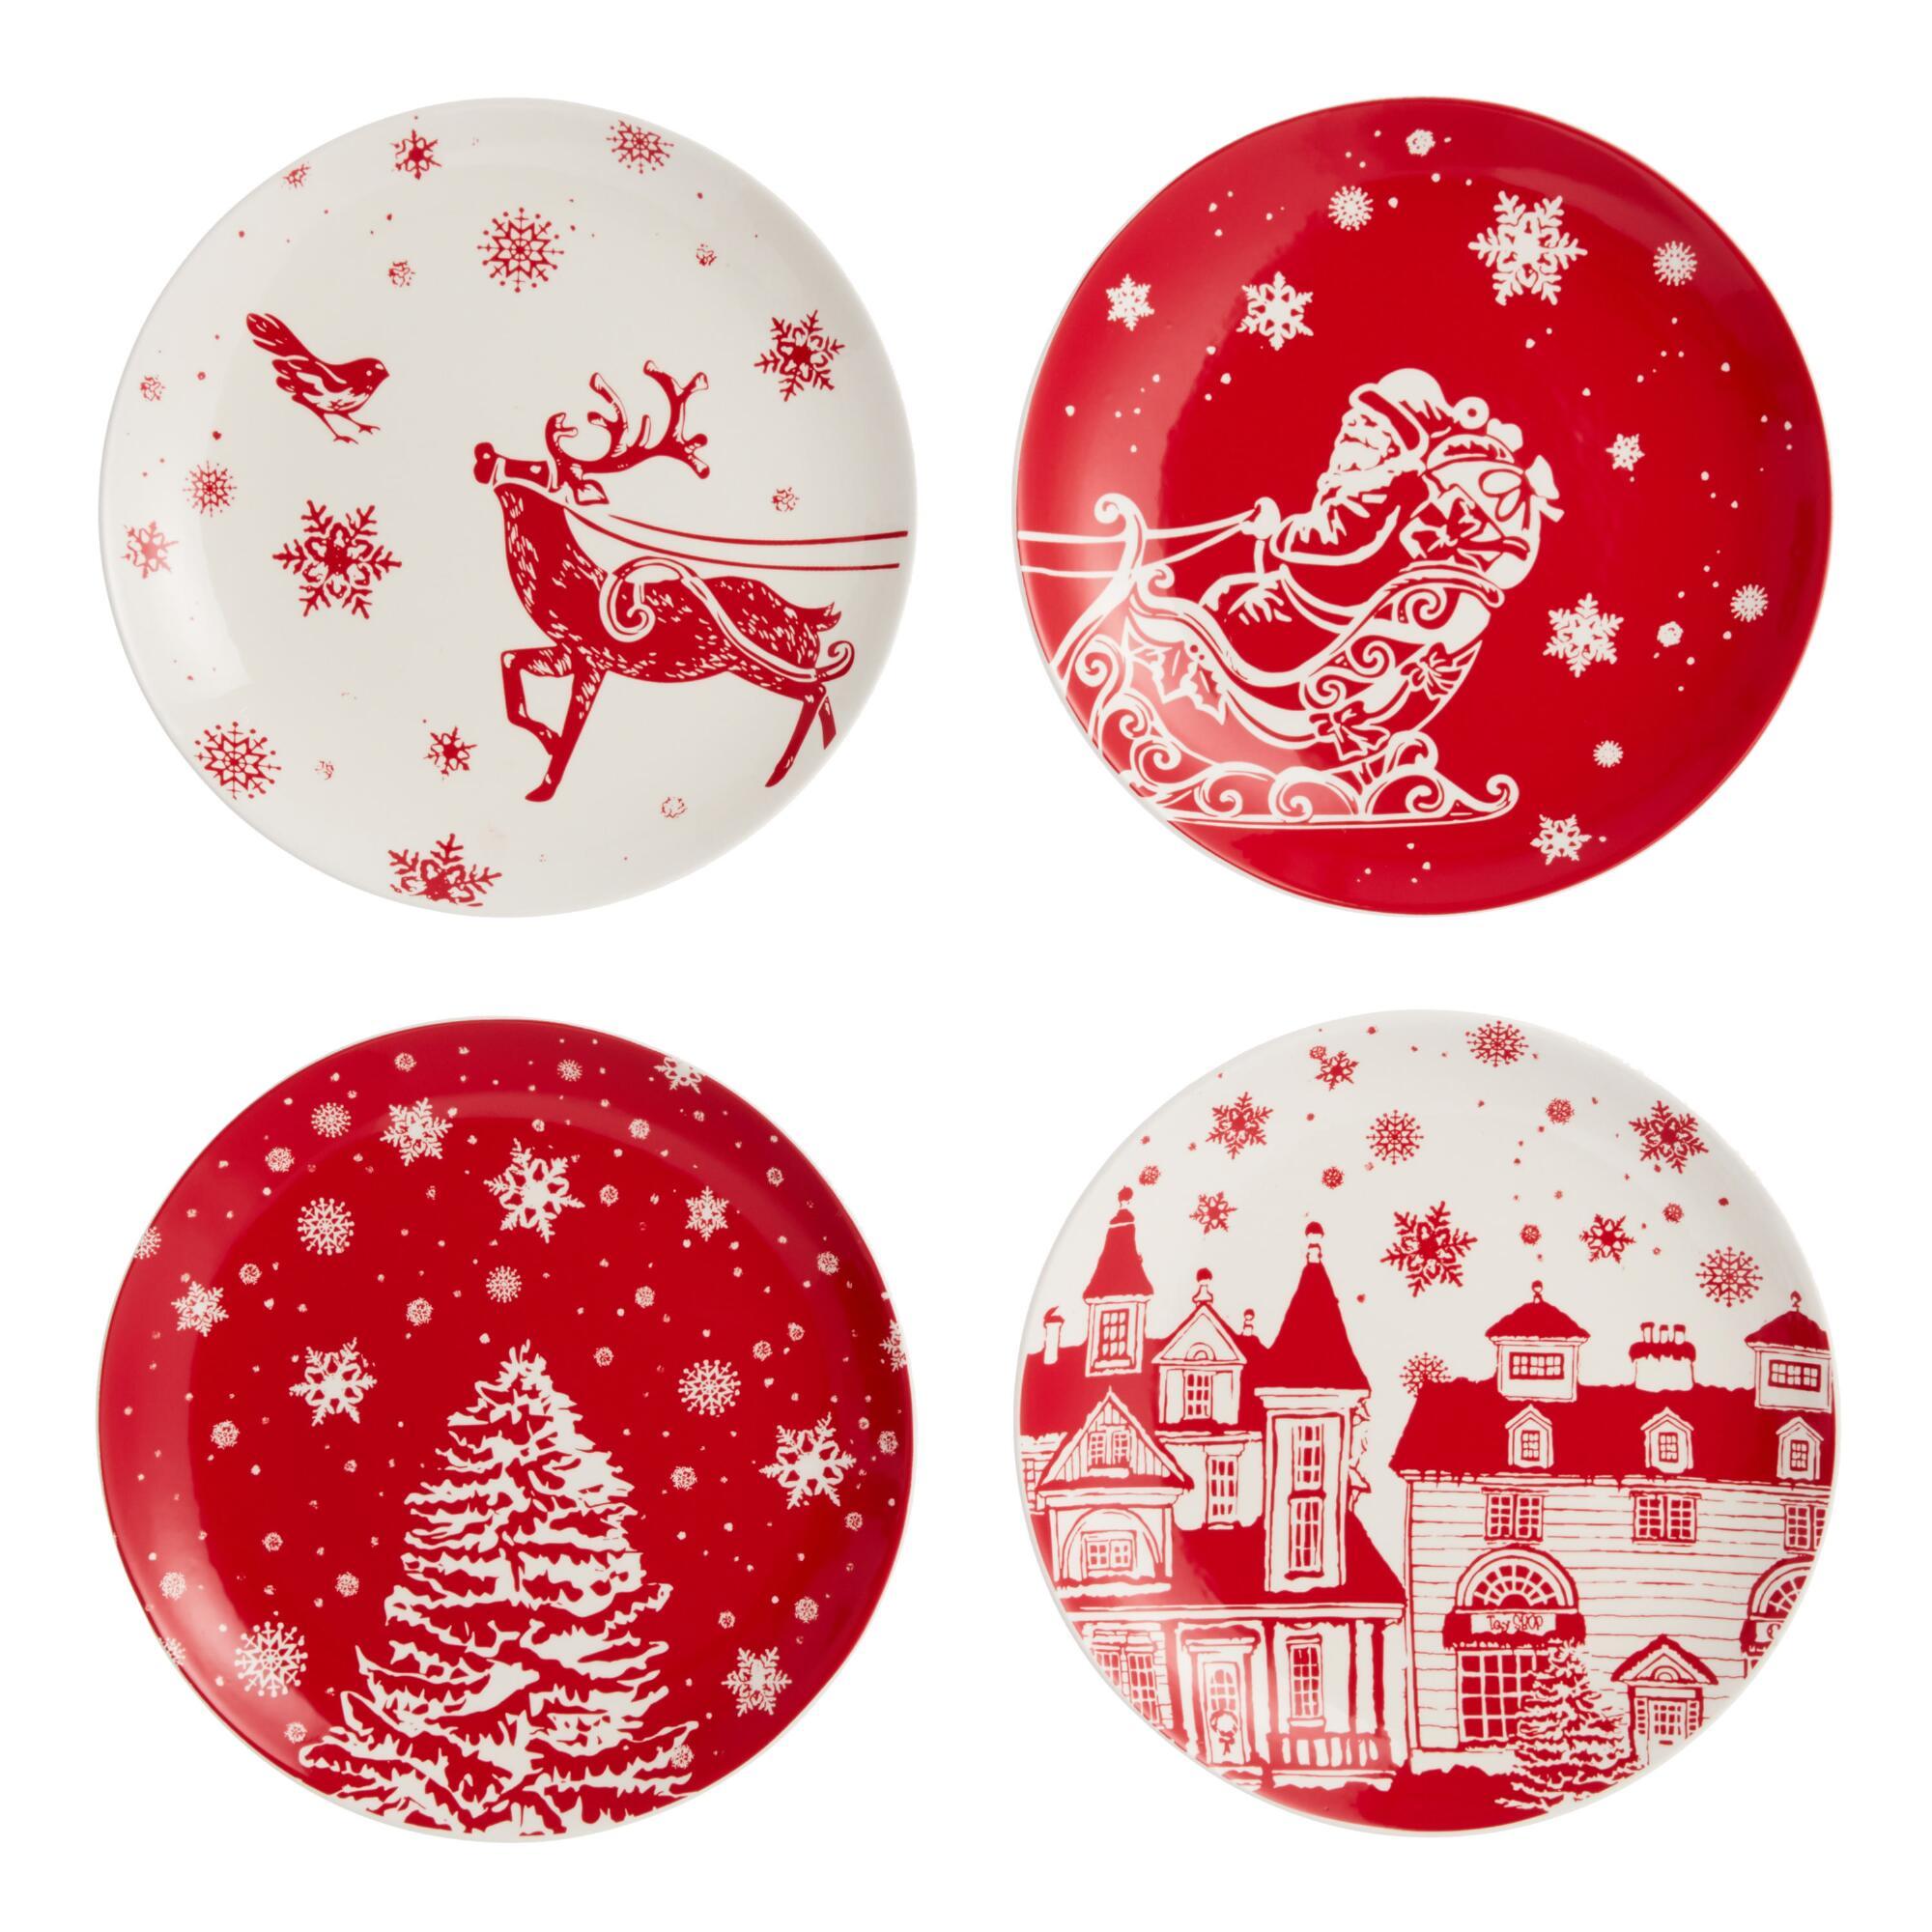 Winter Wonderland Holiday Plates 4 Pack $29.99